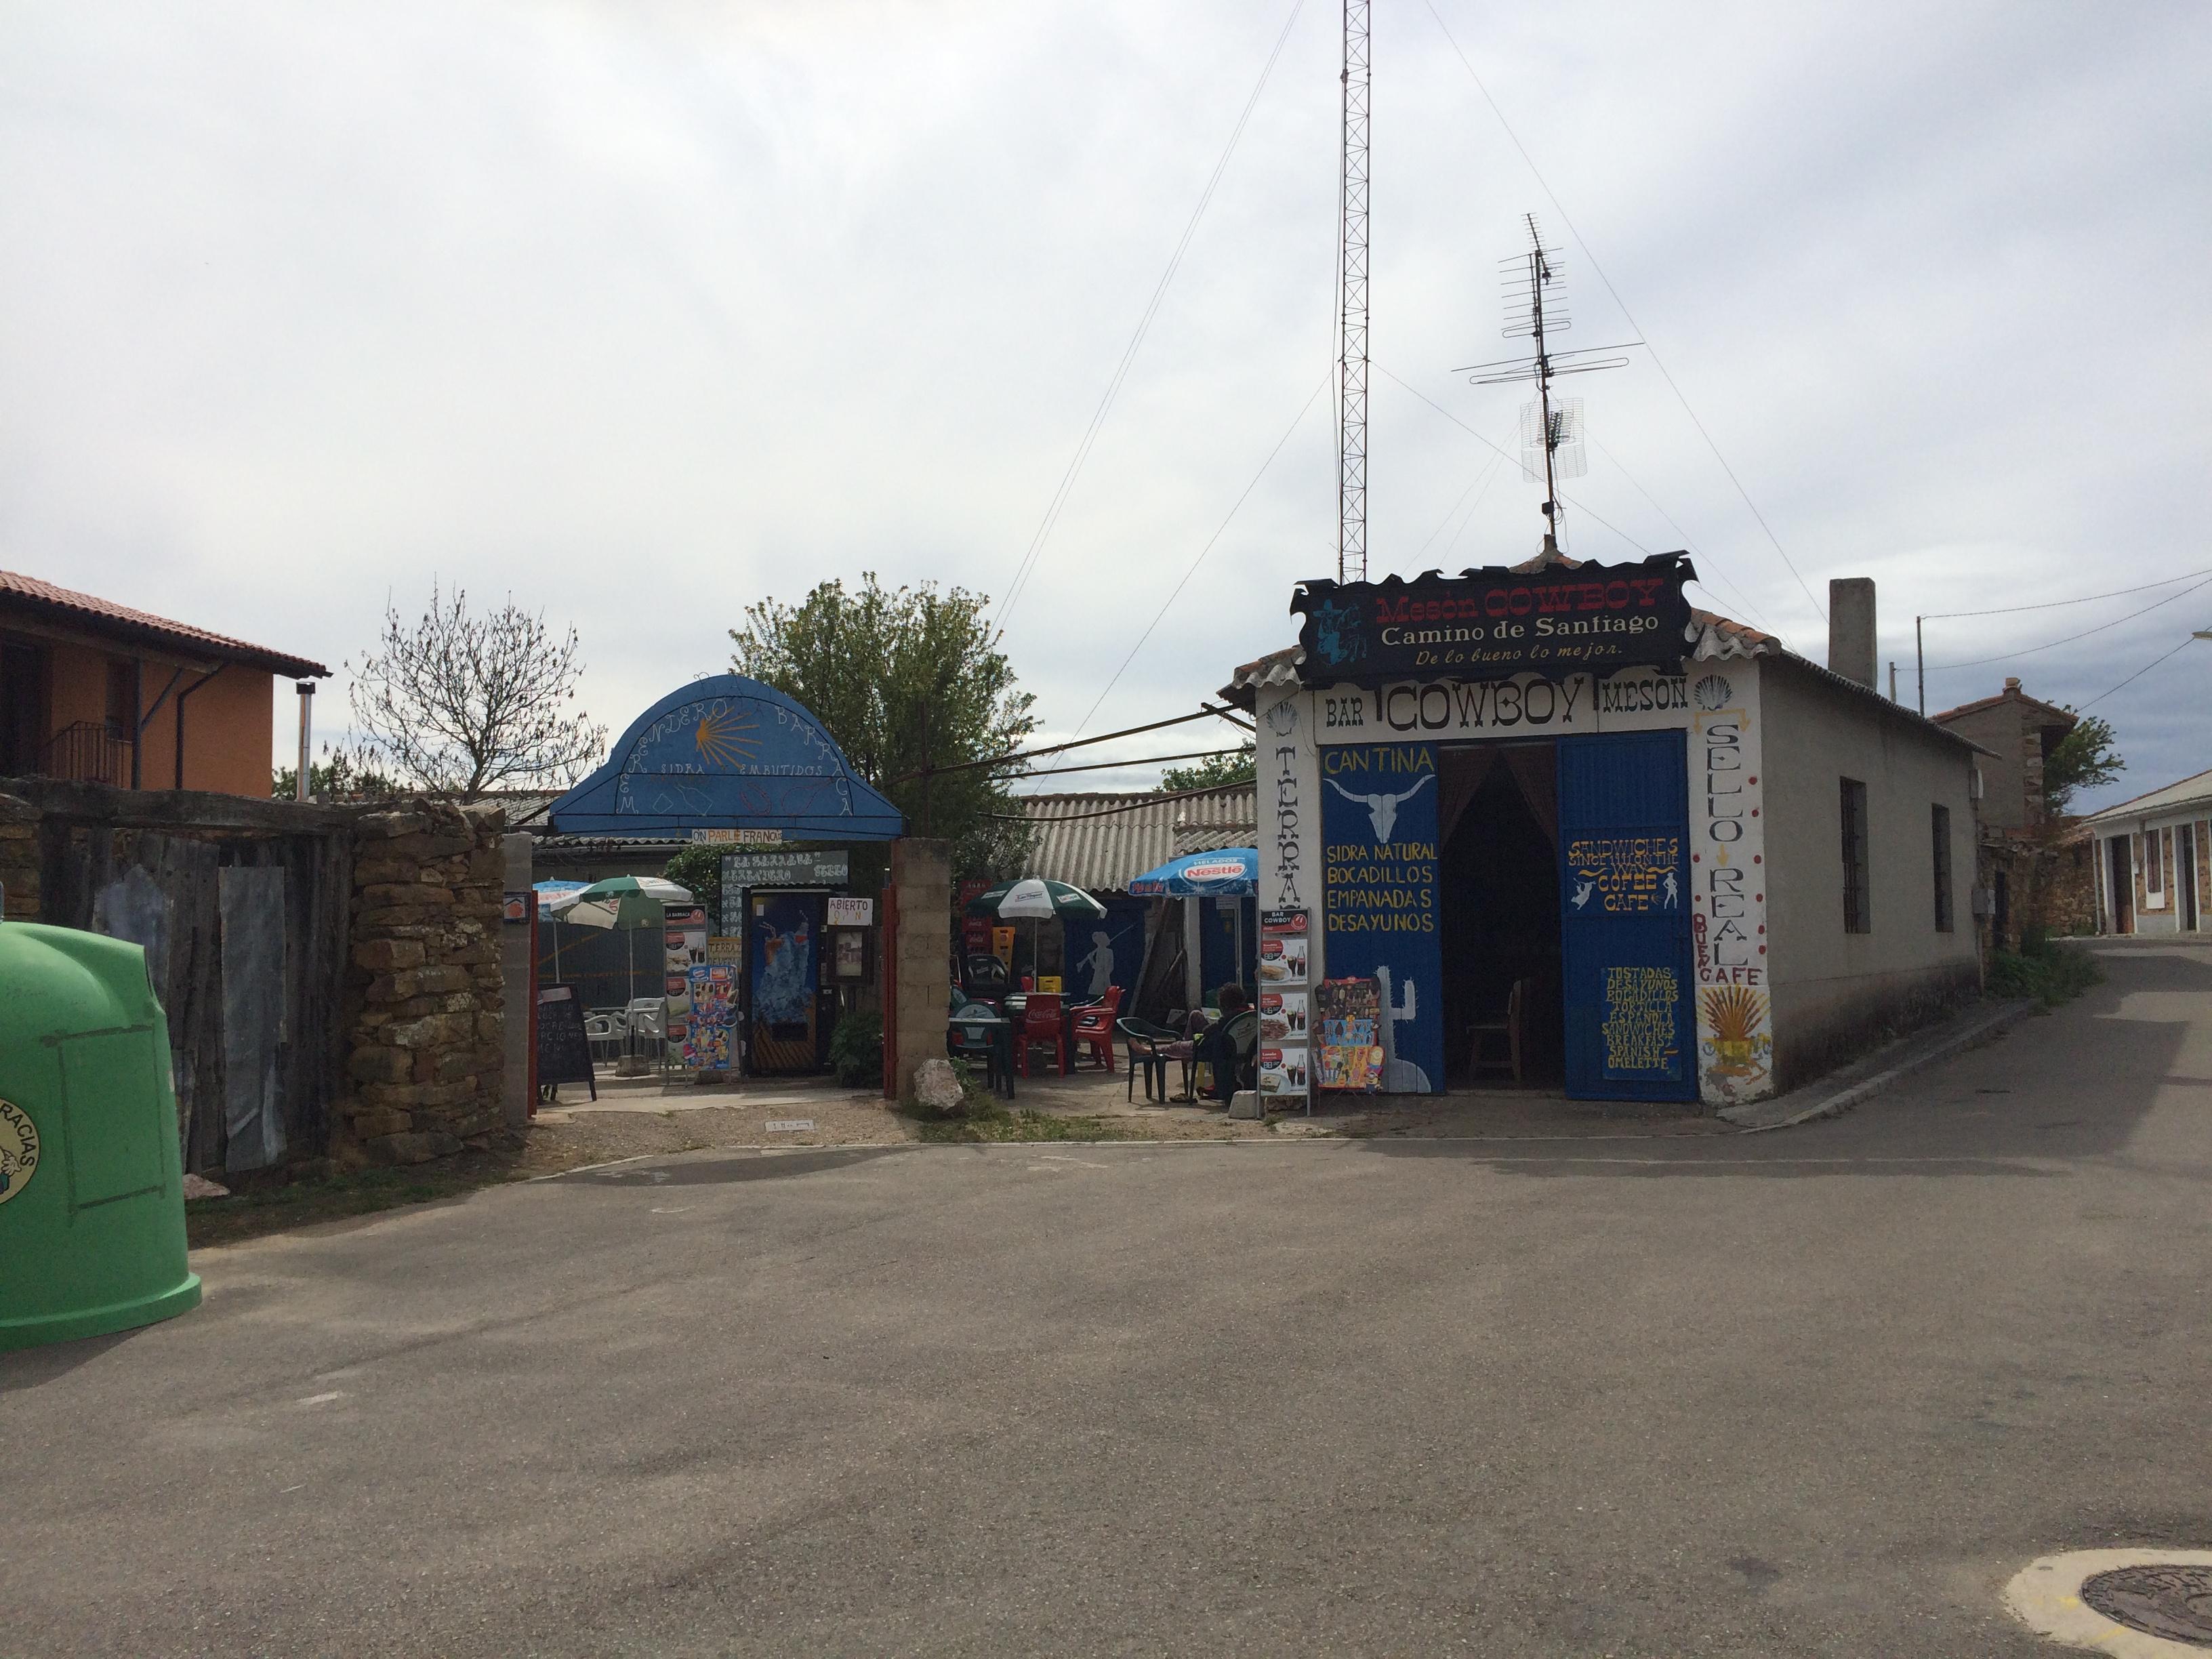 Day 32 - Santibáñez de Valdeiglesia to Rabanal del Camino - June 5, 2017